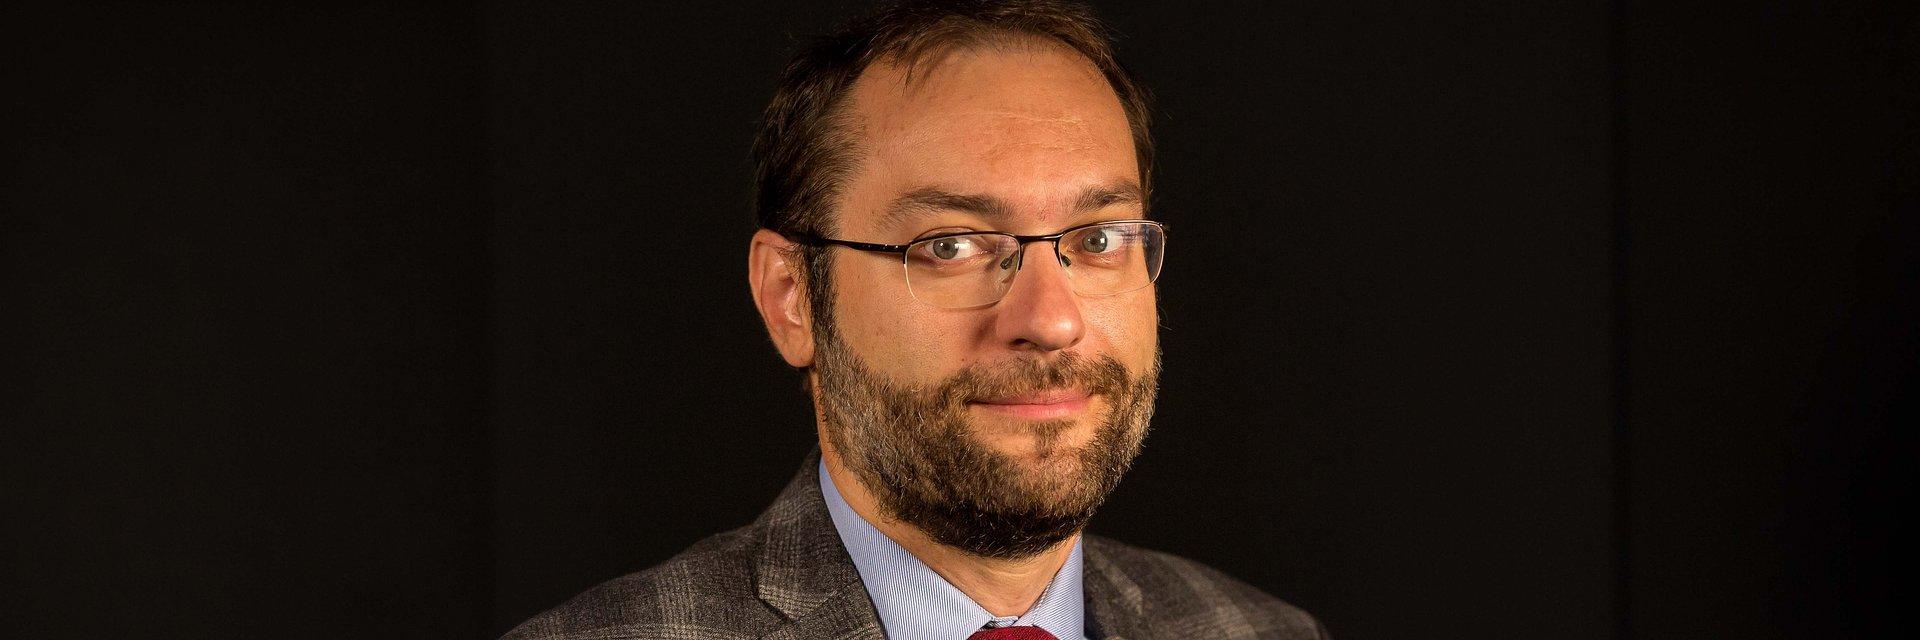 Dr hab. Tomasz Kamiński